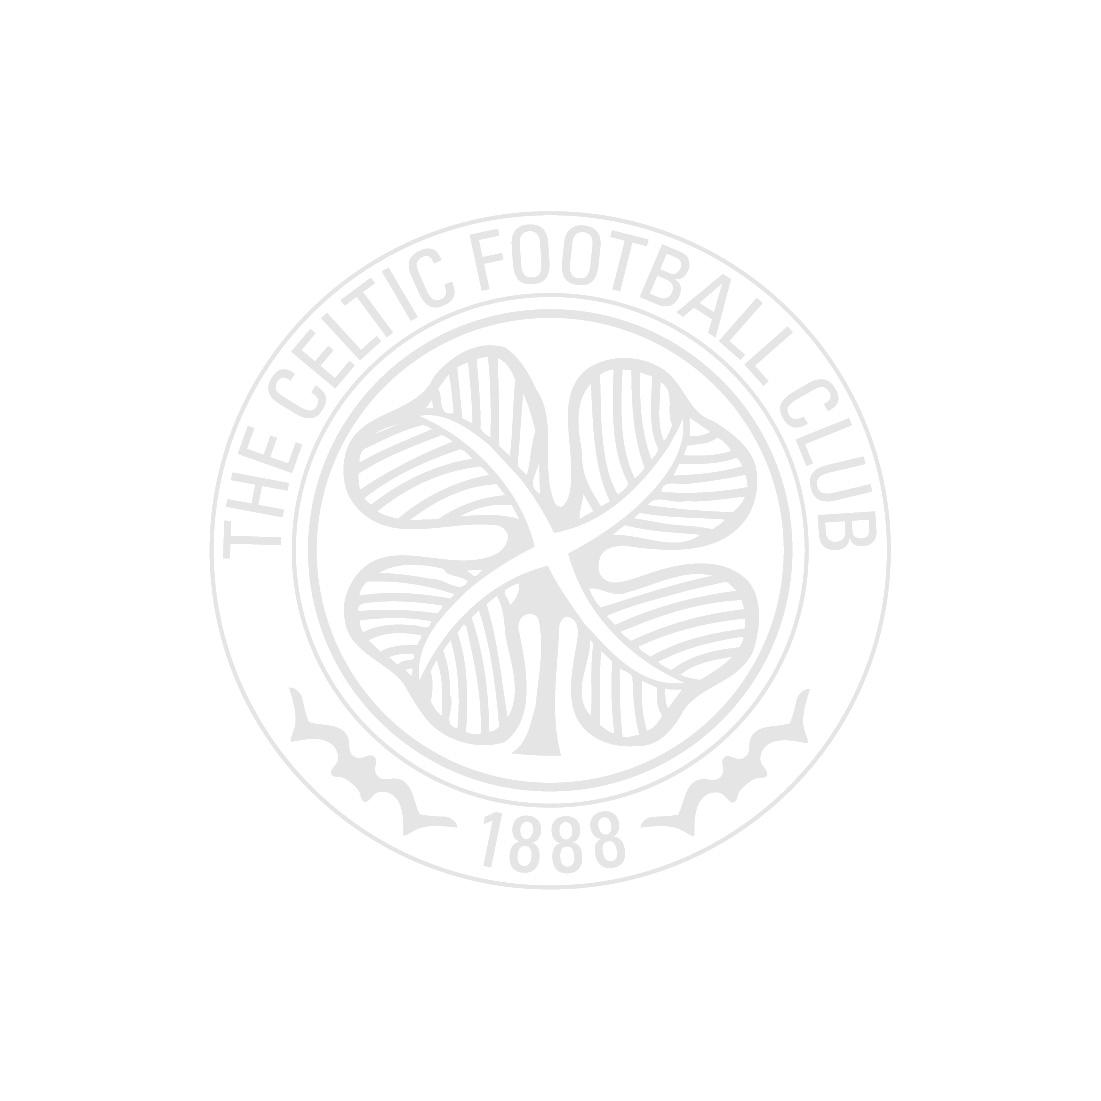 Celtic Hooped Bean Bag - Online Exclusive